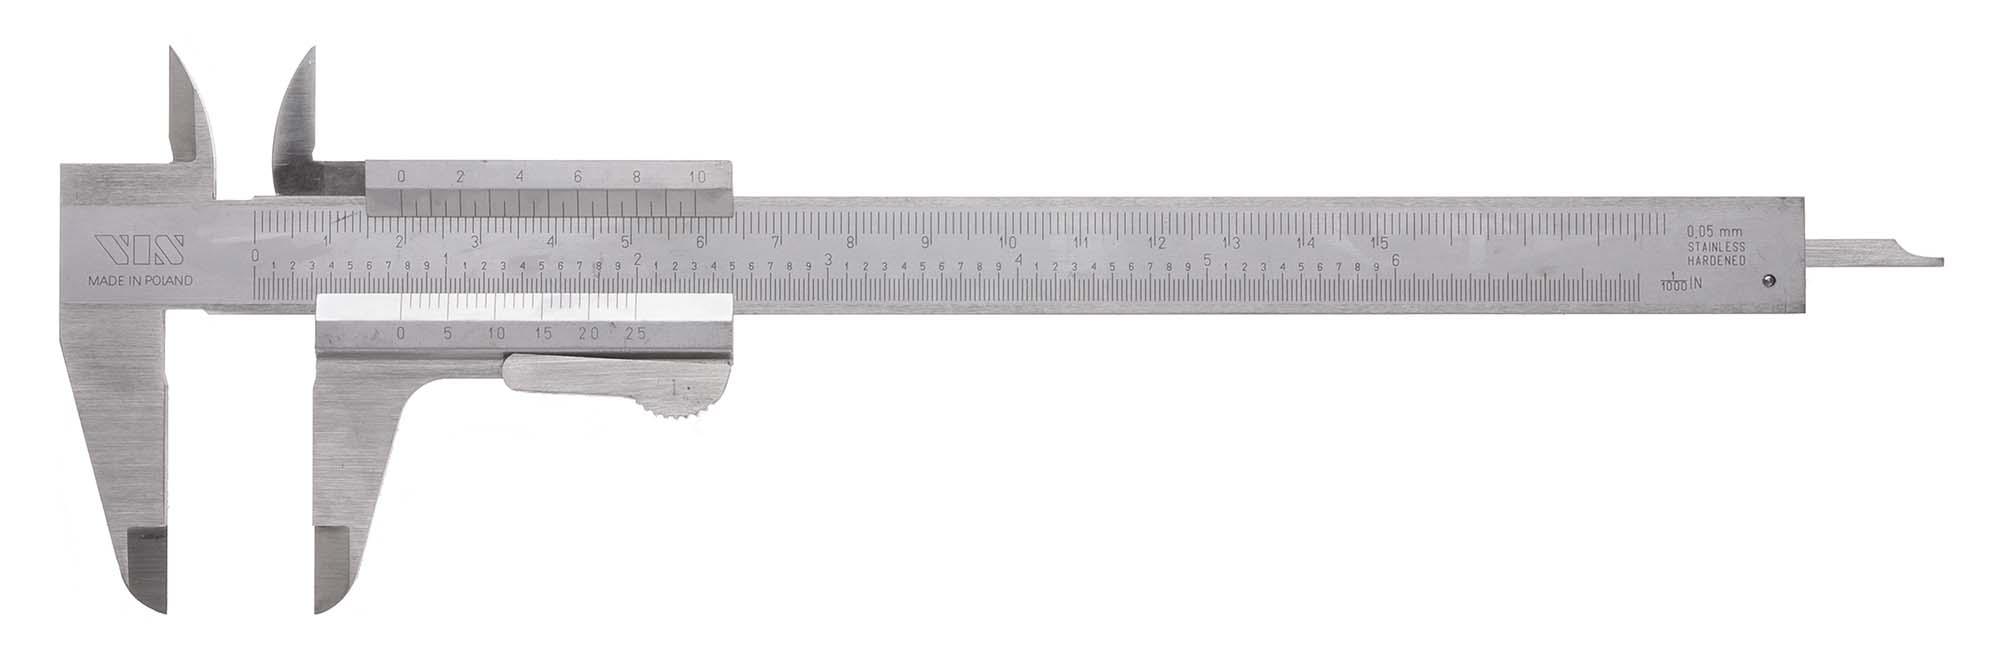 "6"" VIS Vernier Caliper with Thumblock, .001"", 1/20mm"